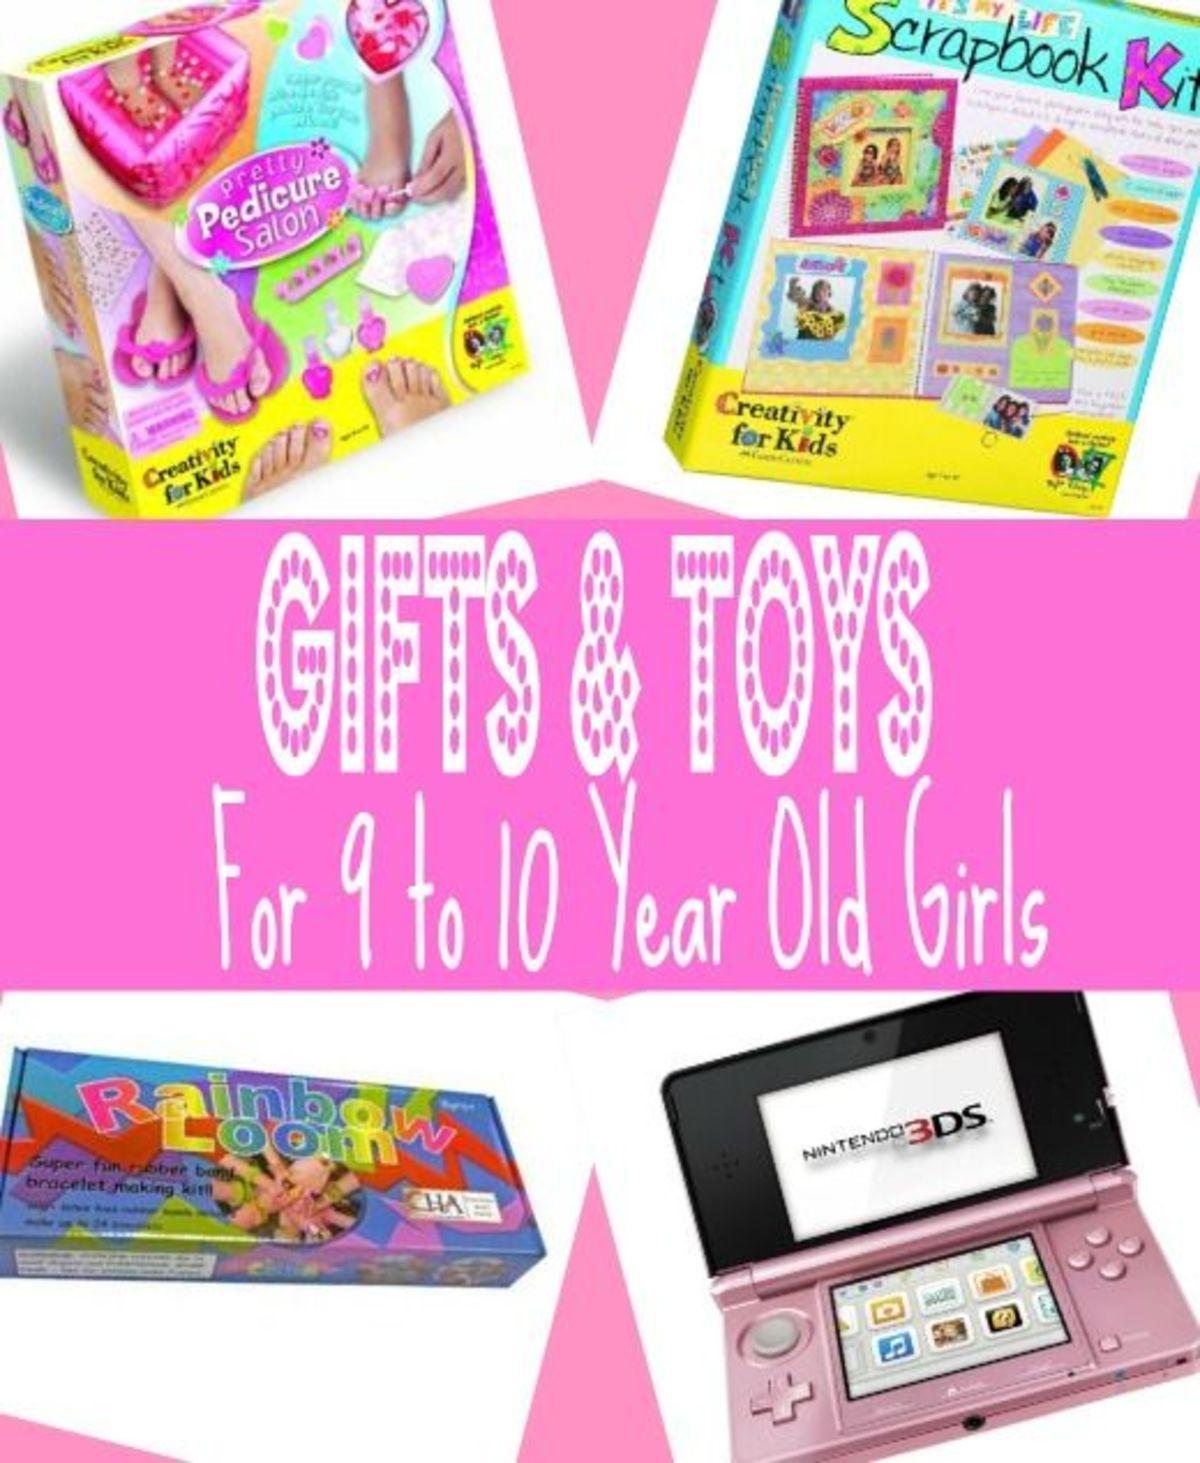 Christmas Gift Ideas For A Nine Year Girl - rjmovers.com